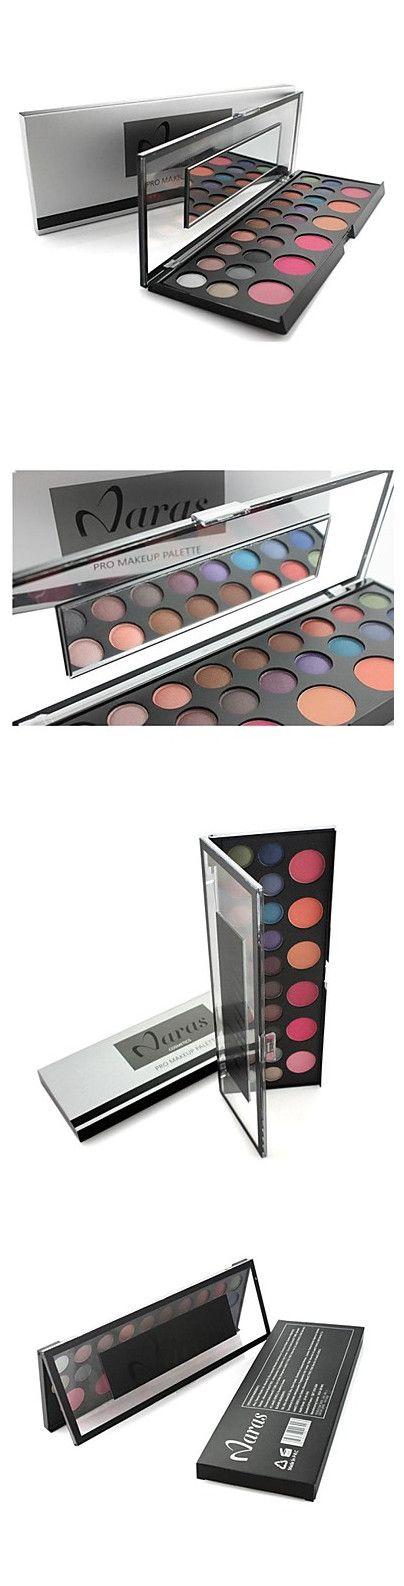 Professional Naras 26 Color Makeup Set 20 Color Eyeshadow+ 6 Color Blush Set Cosmetic Palette Set with Mirrror